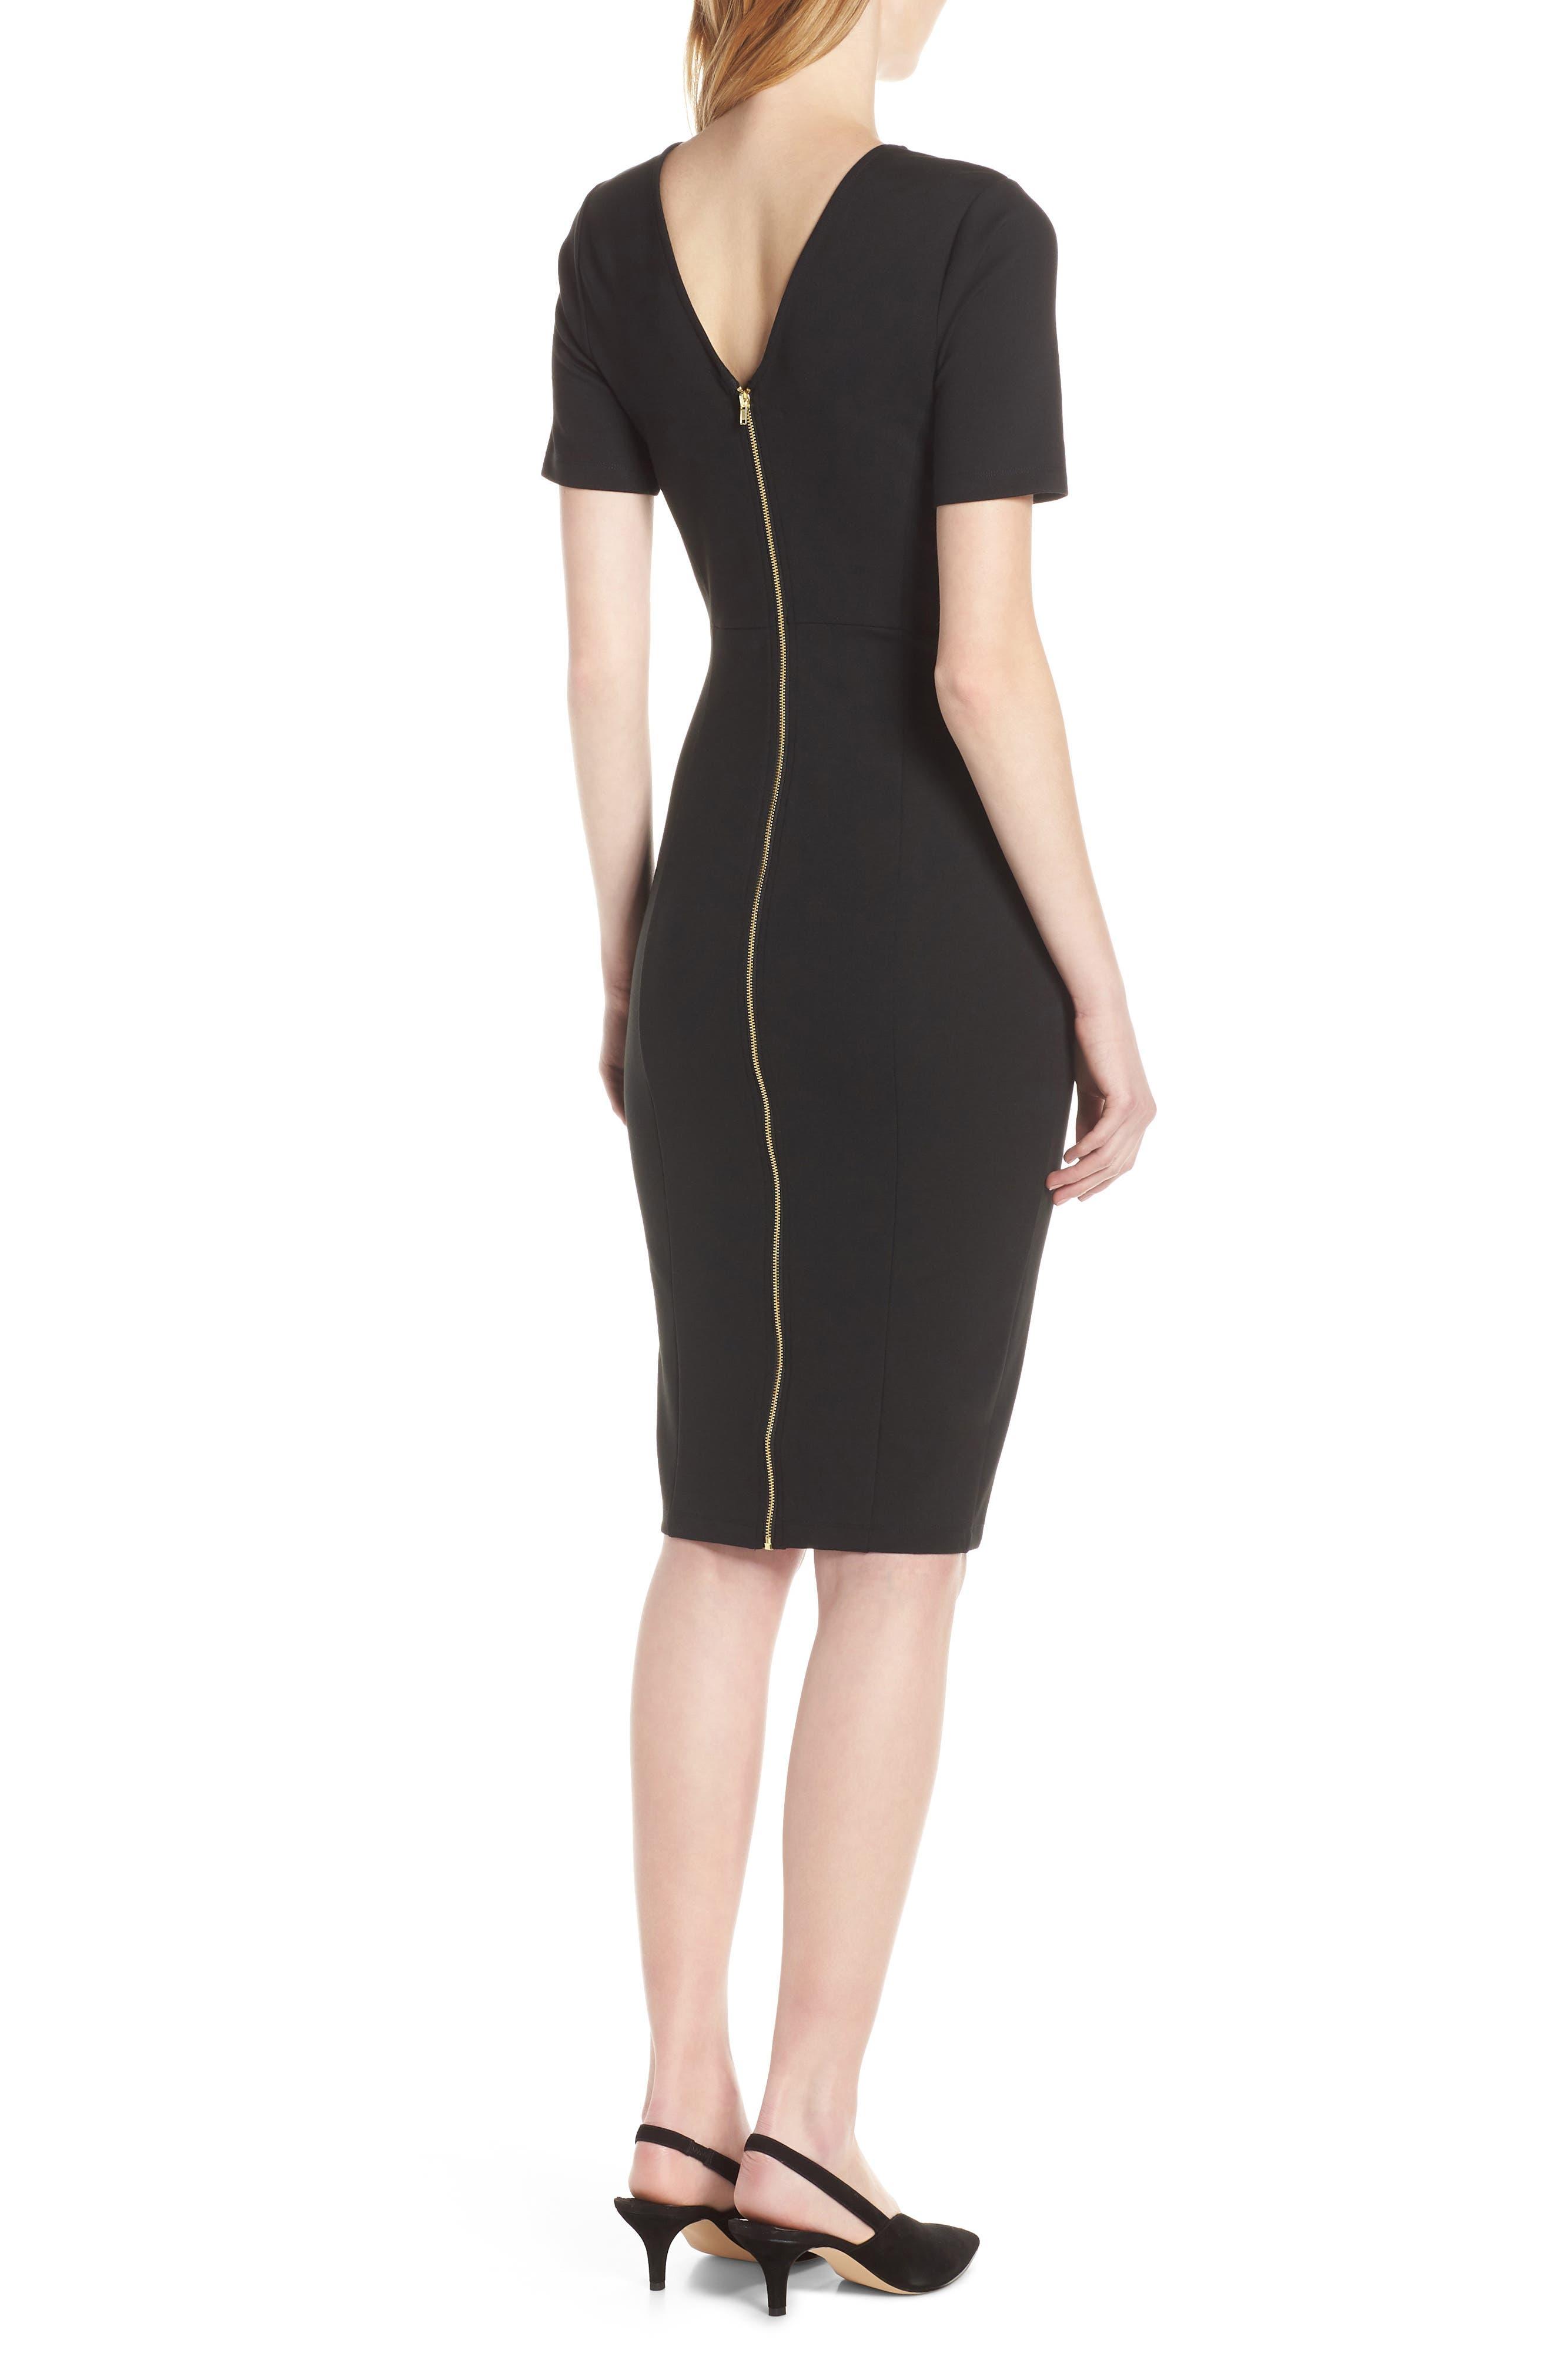 ALI & JAY Zip Back Sheath Dress, Main, color, BLACK